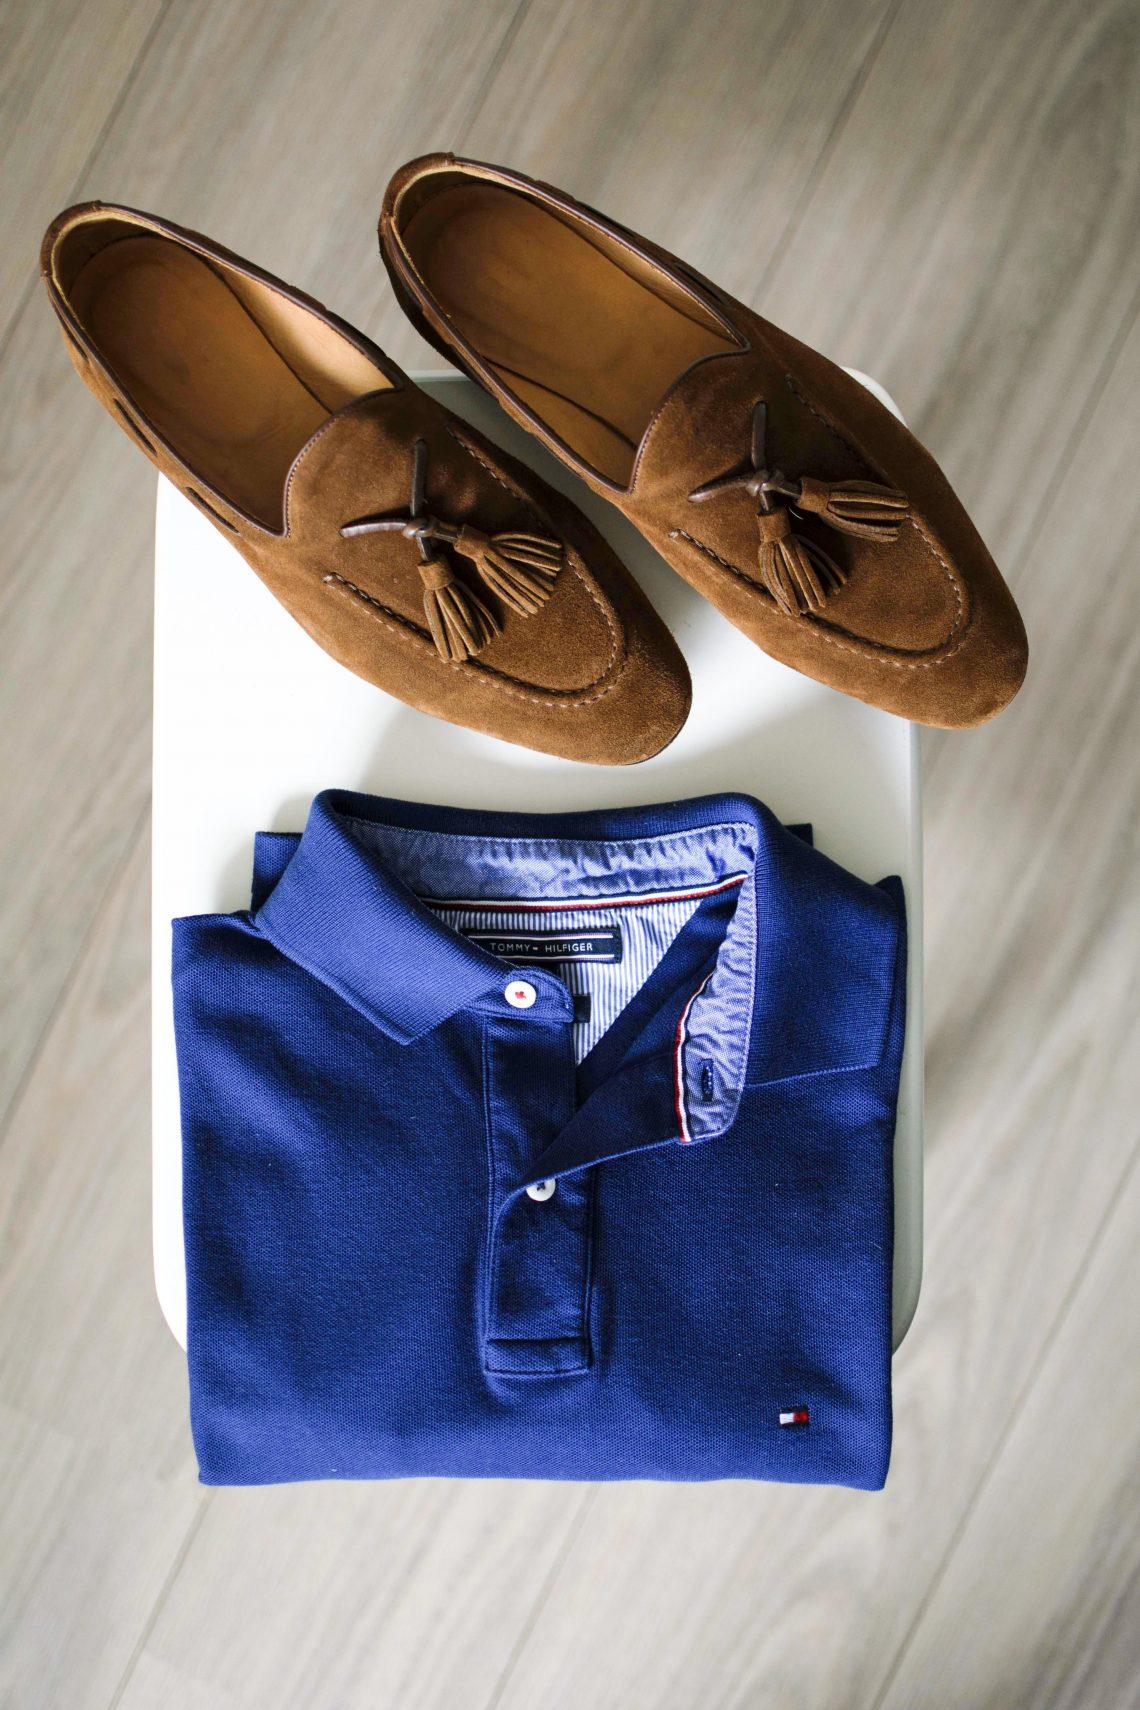 blauwe-tommy-hilfiger-polo